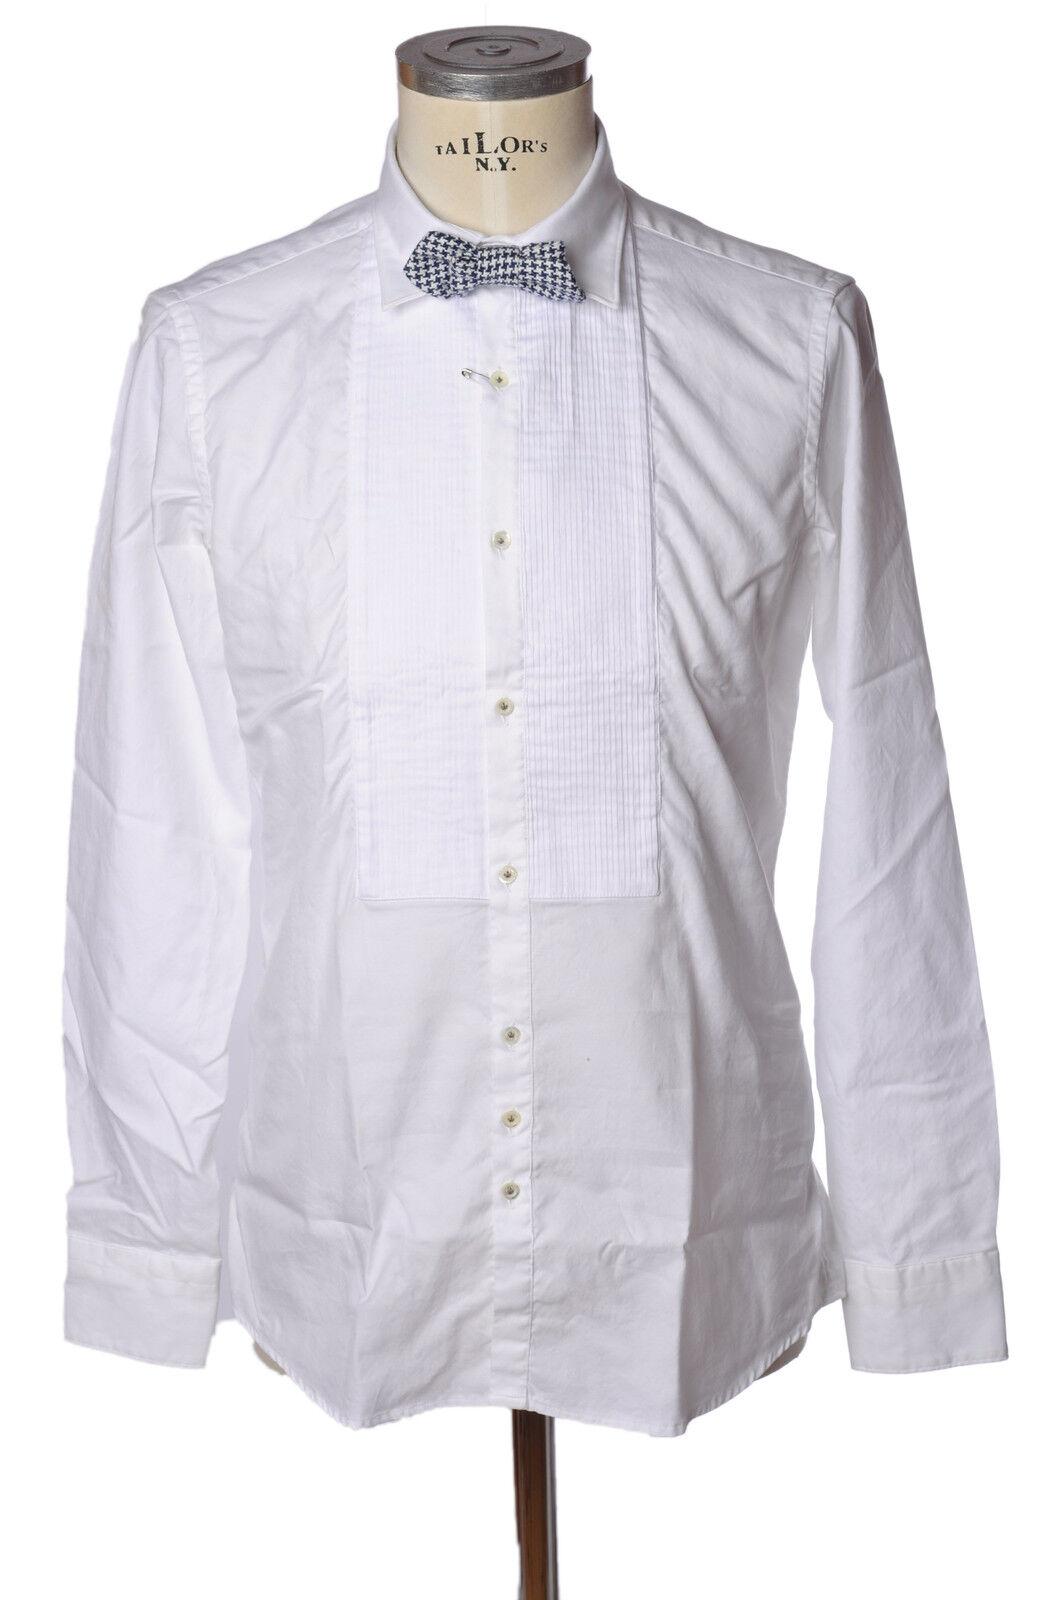 Aglini  -  Shirts - male - Weiß - 238926A184635